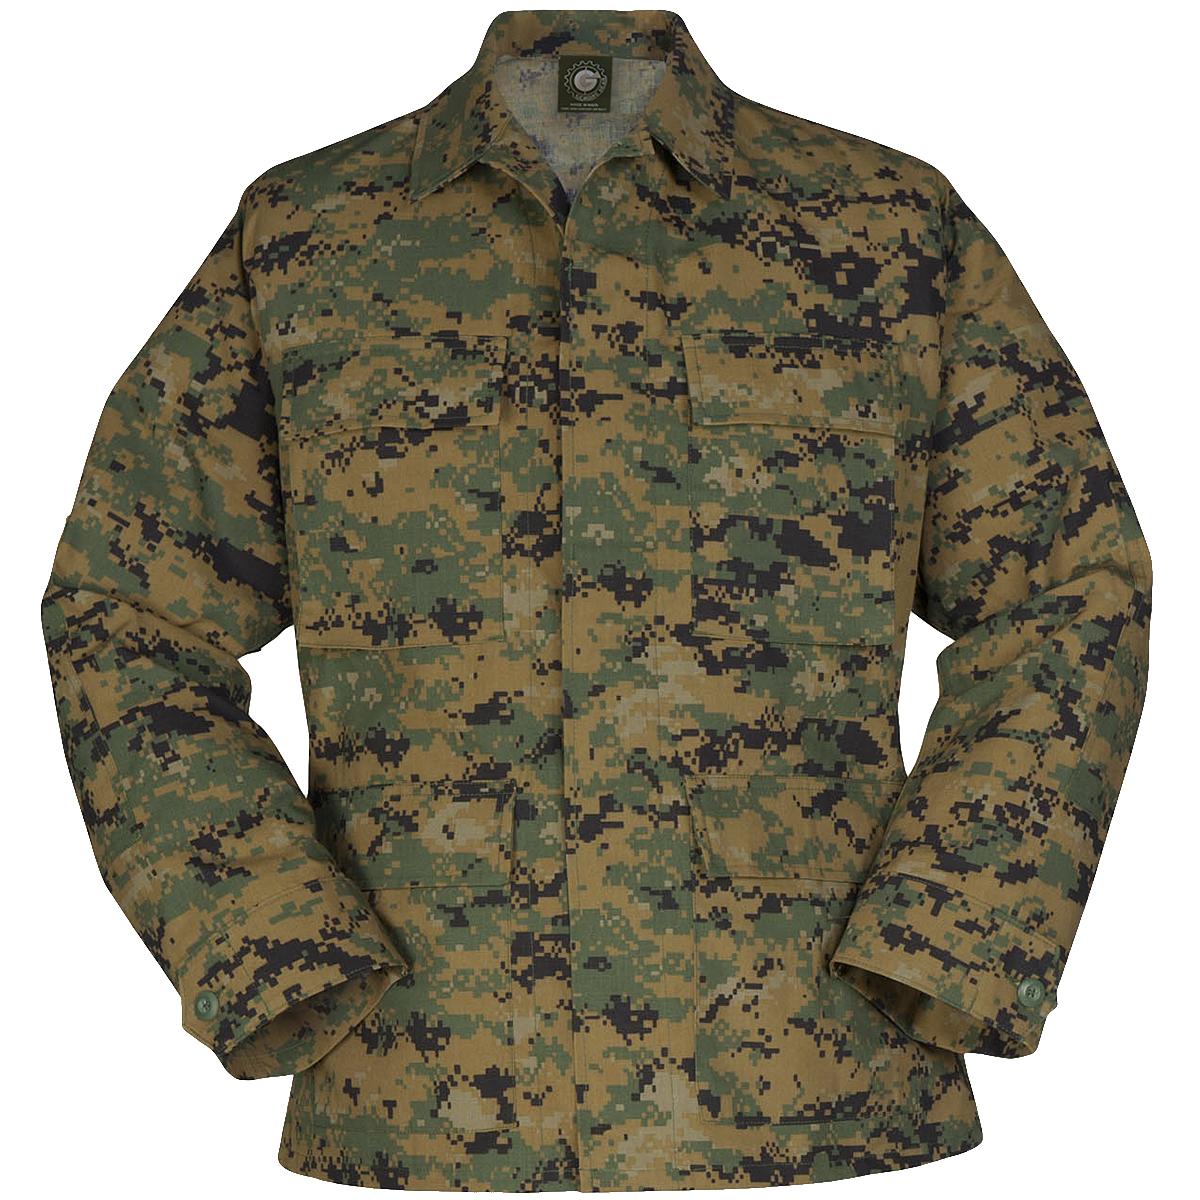 Details about Propper Uniform BDU Coat Army Mens Combat Work Uniform Digital  Woodland Camo a7536c2e135